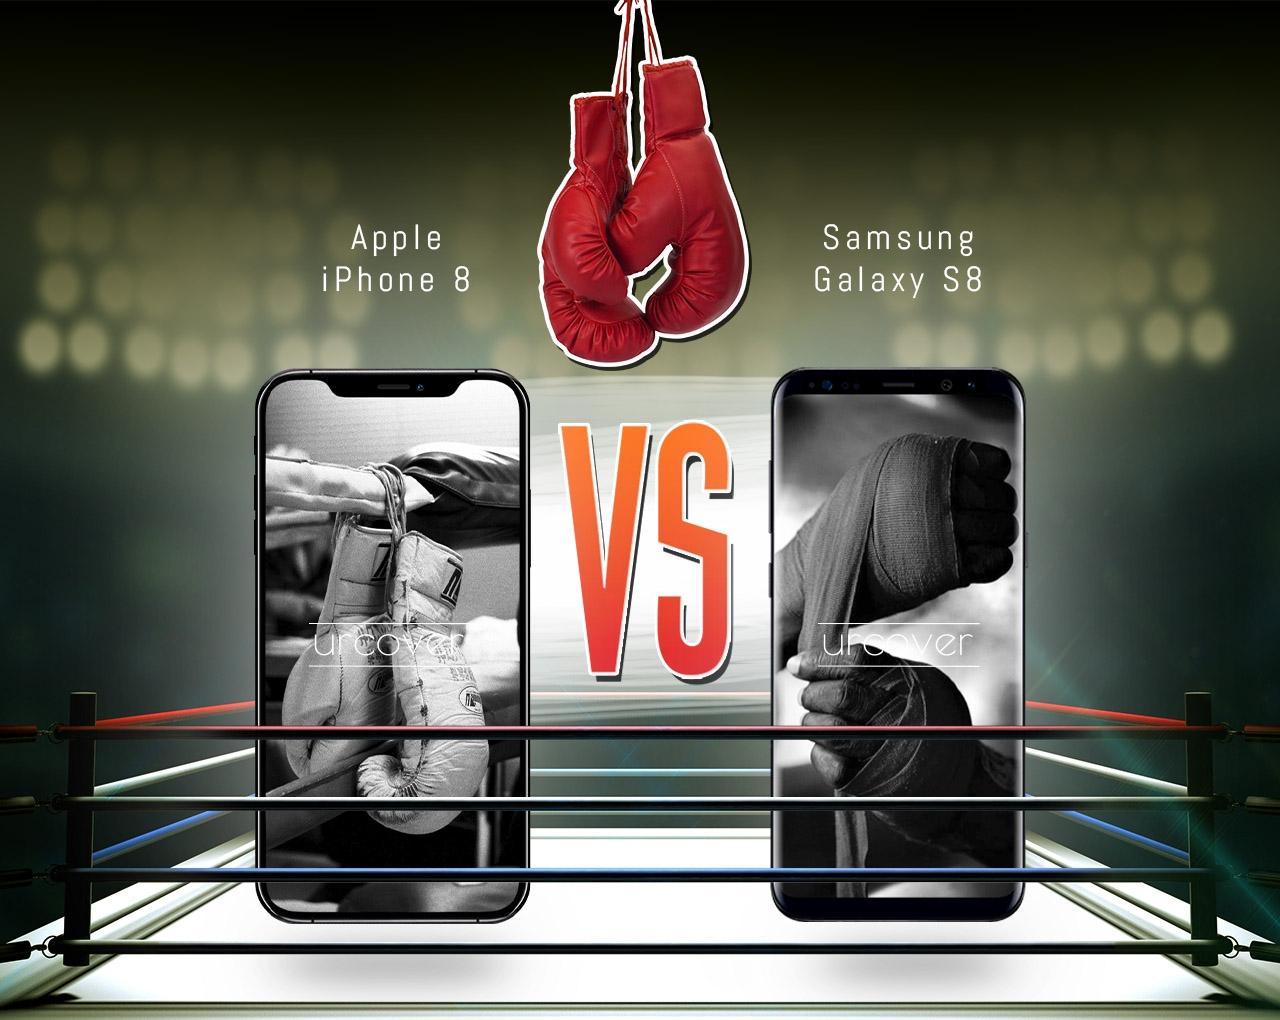 iPhone 8 vs. Galaxy S8